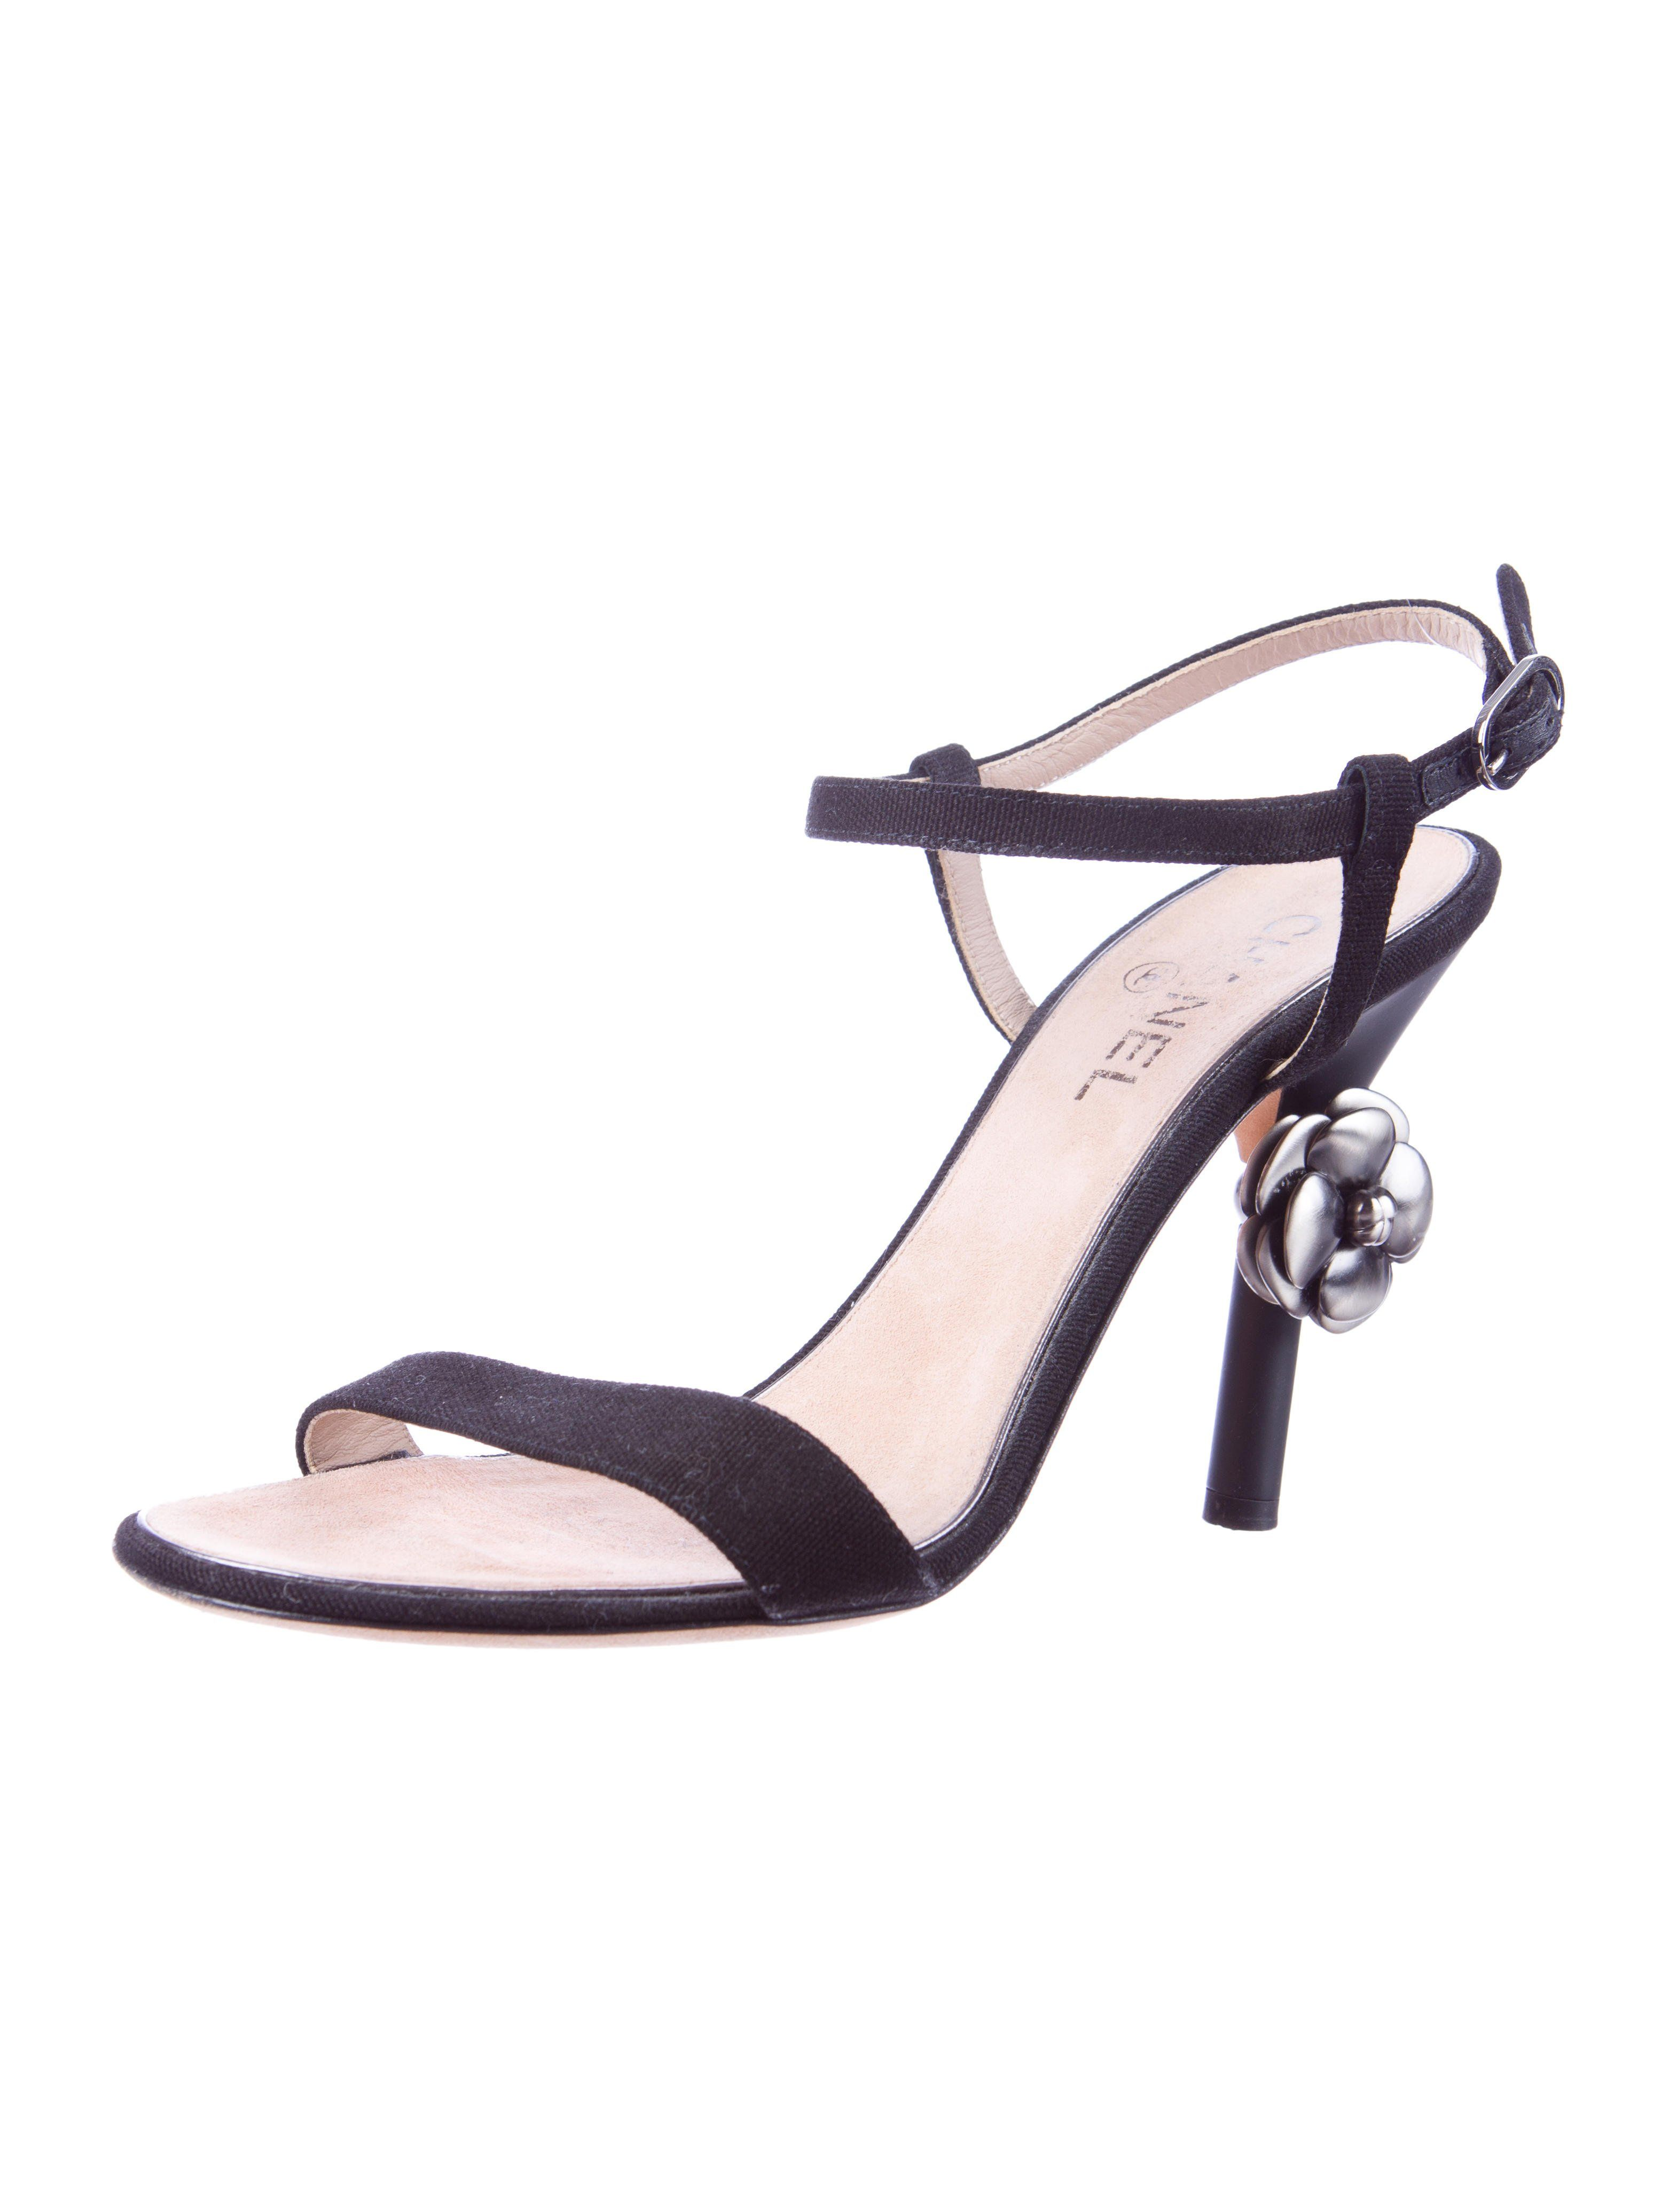 01e0864459dd1b Camellia Sandals